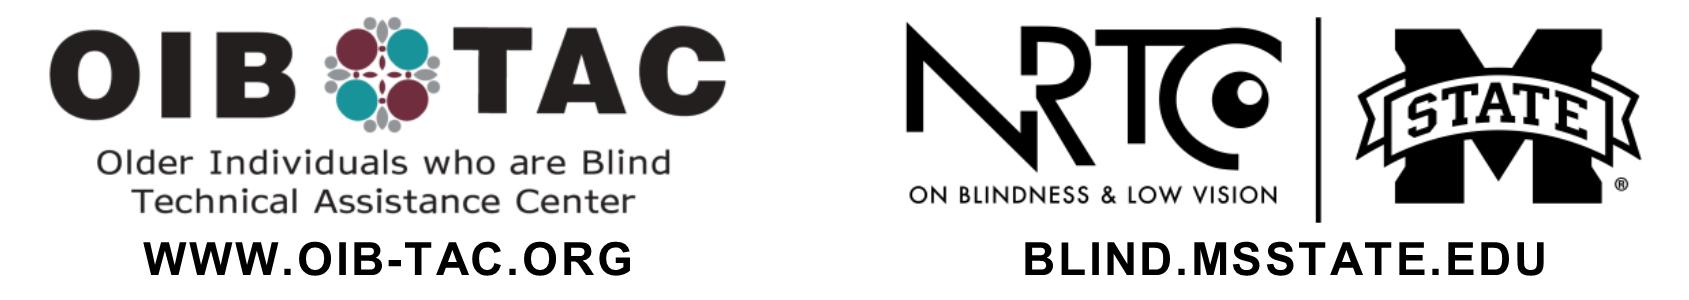 OIB TAC logo next to NRTC Logo text